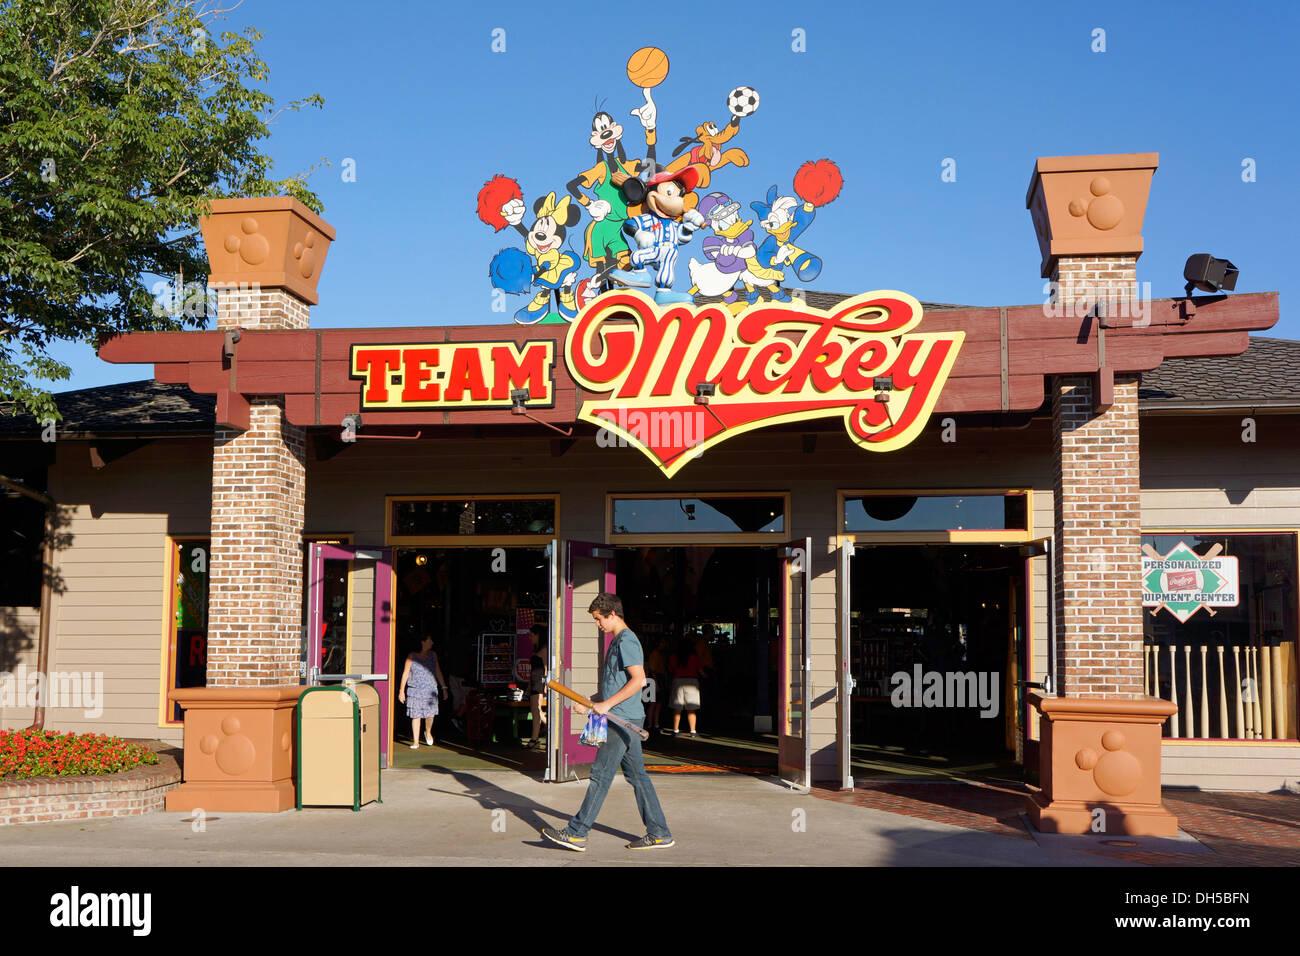 Team Mickey Athletic Club, Downtown Disney Marketplace, Disney World Resort, Orlando Florida - Stock Image